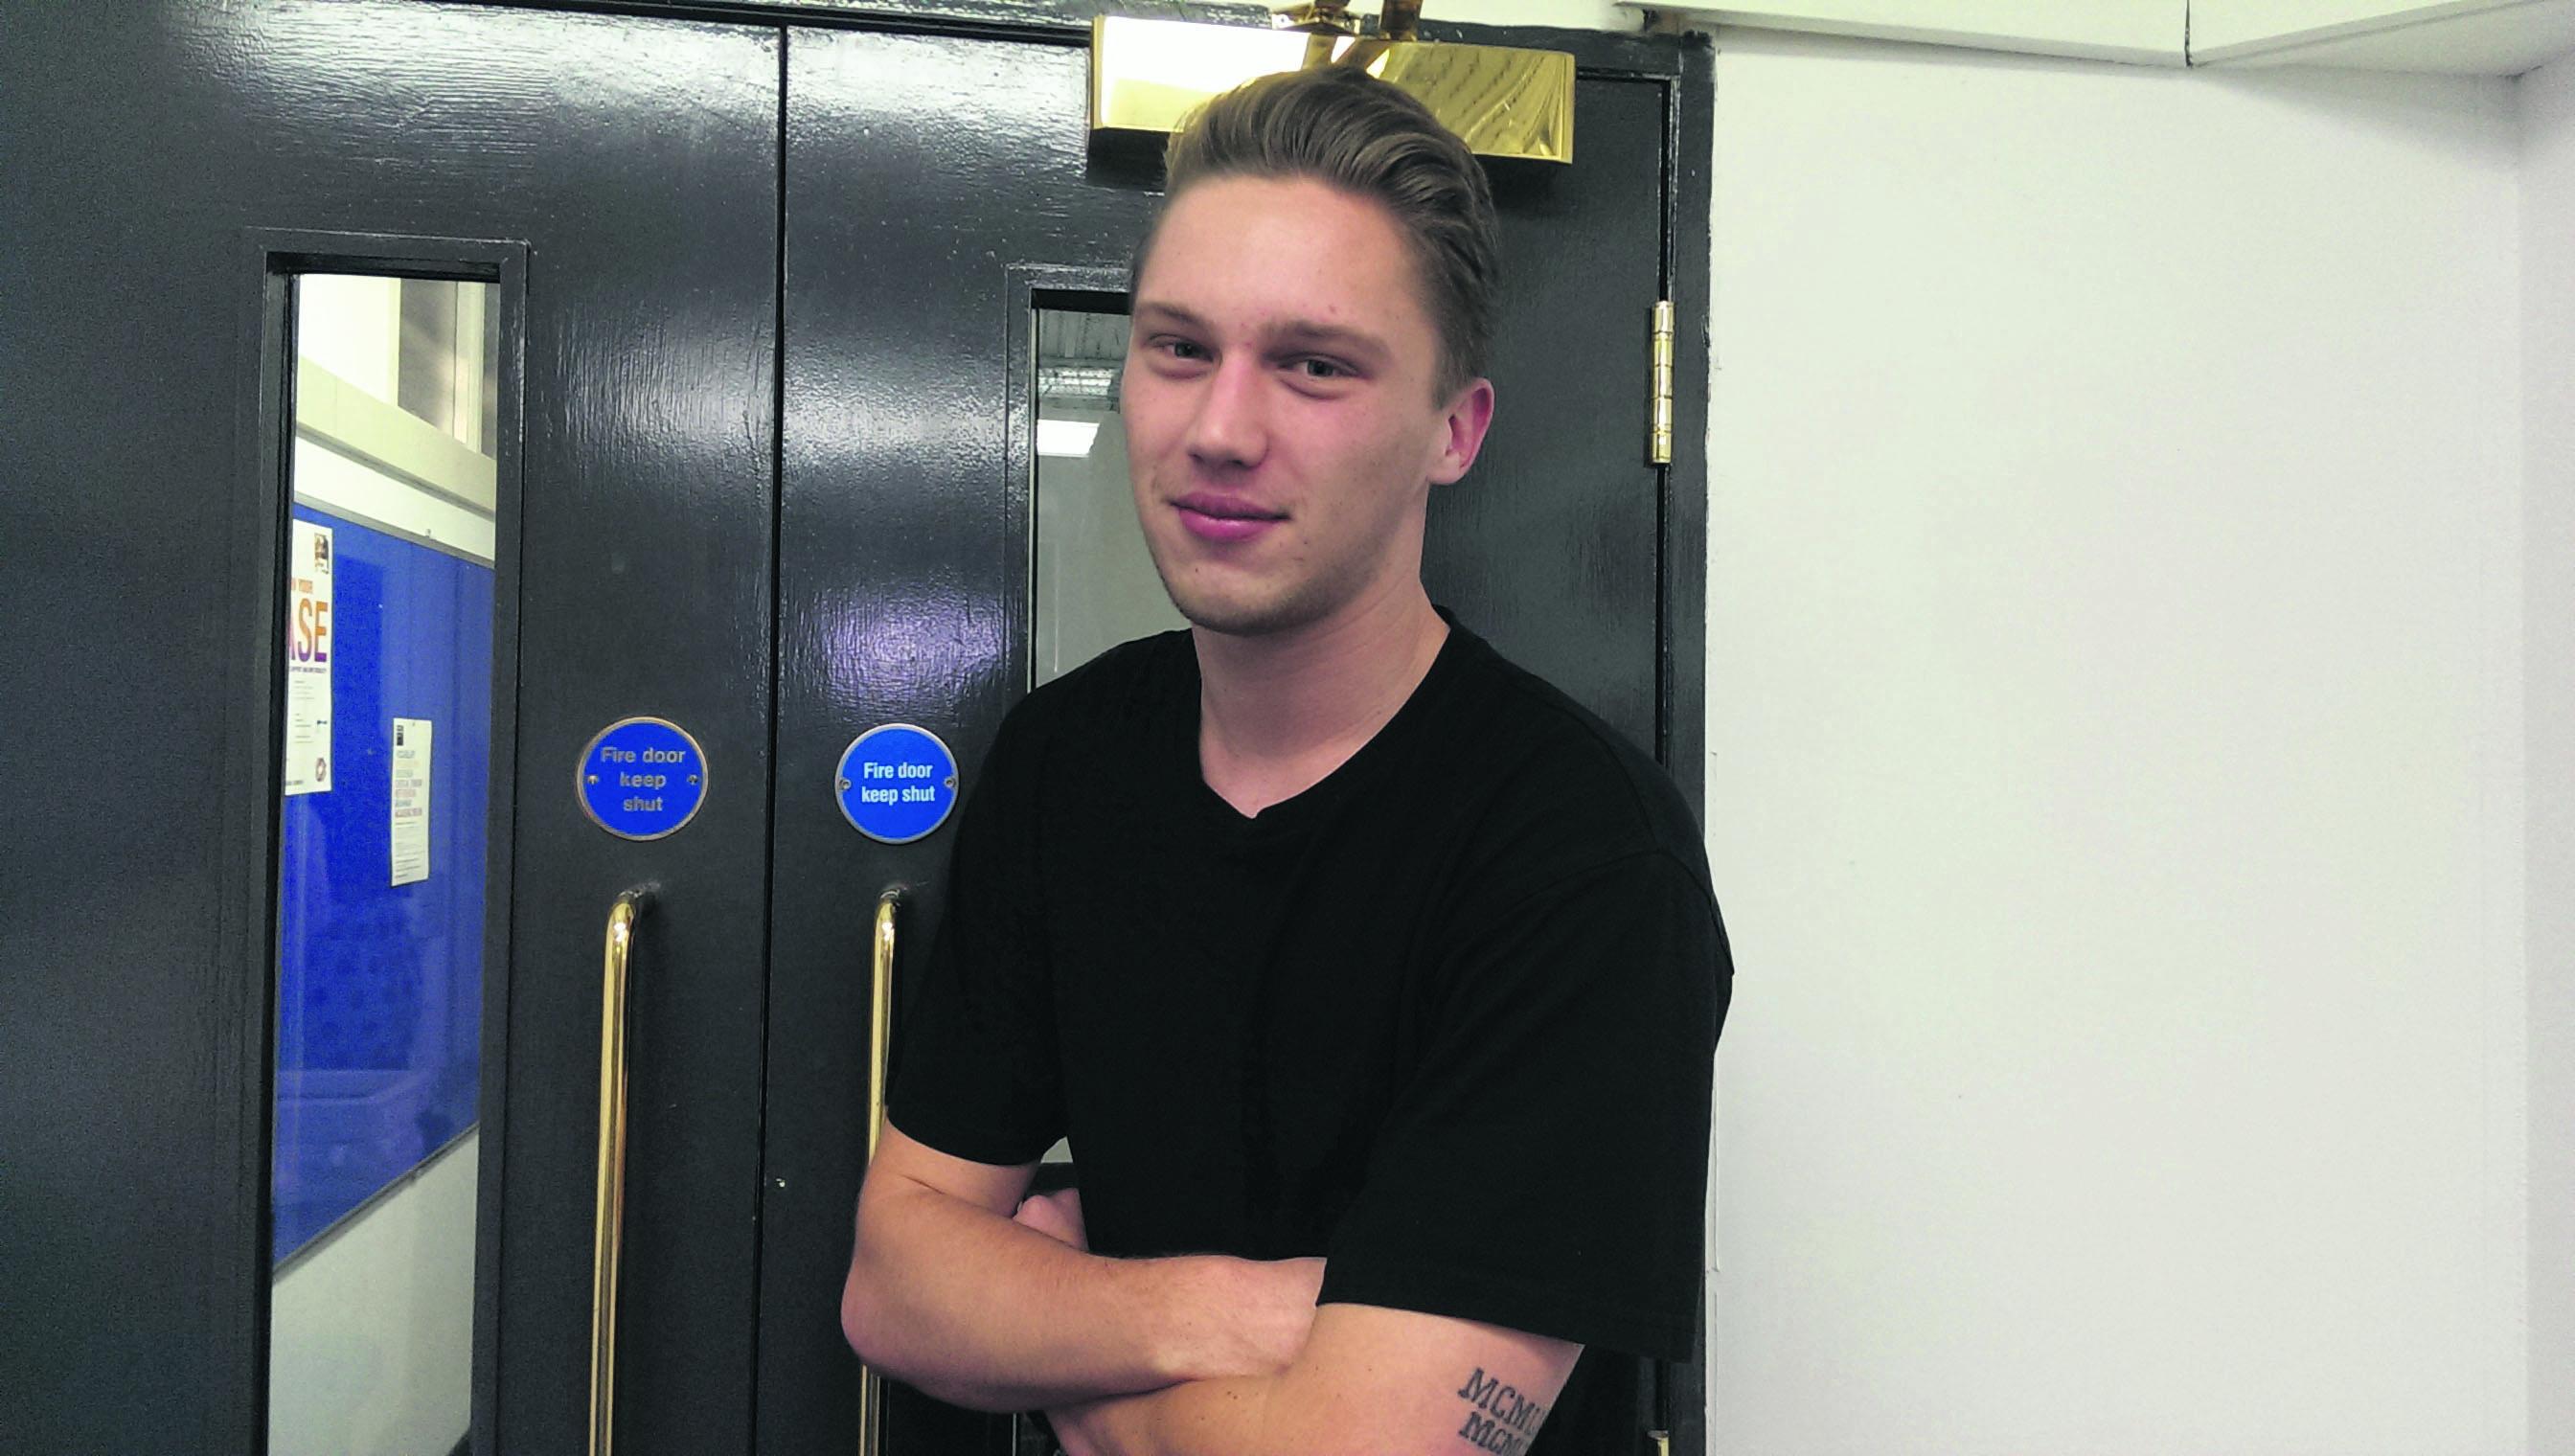 Study abroad student Joshua O'Connor